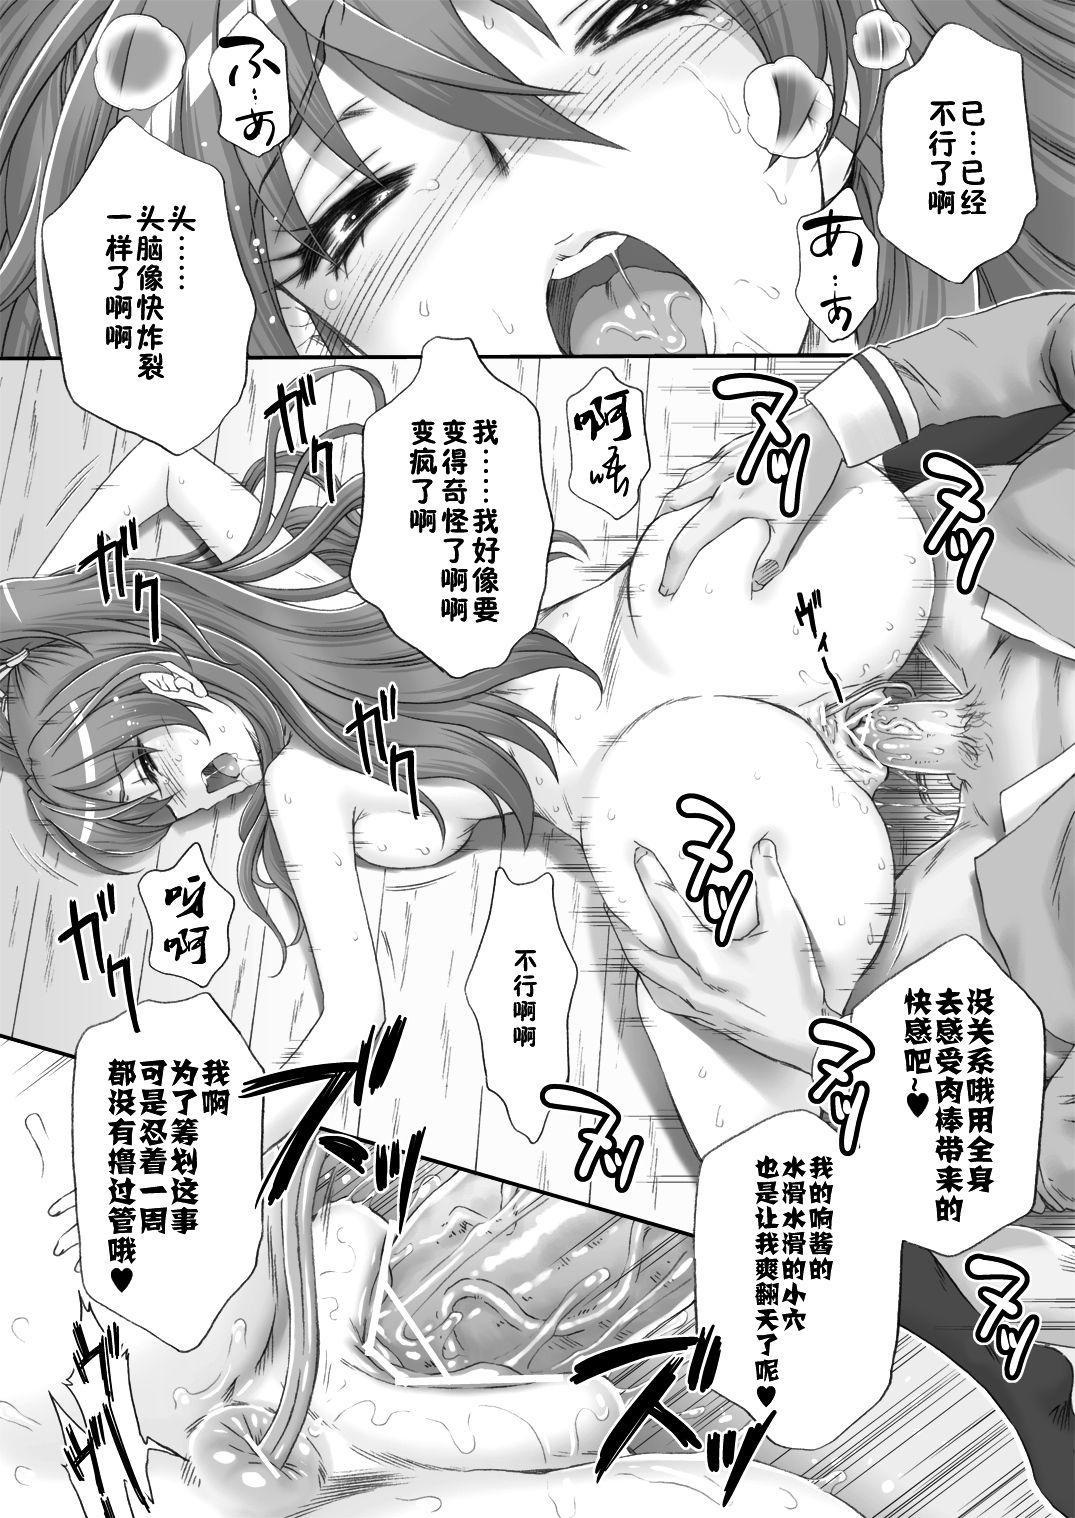 Hibiki de asobou ♪ 27